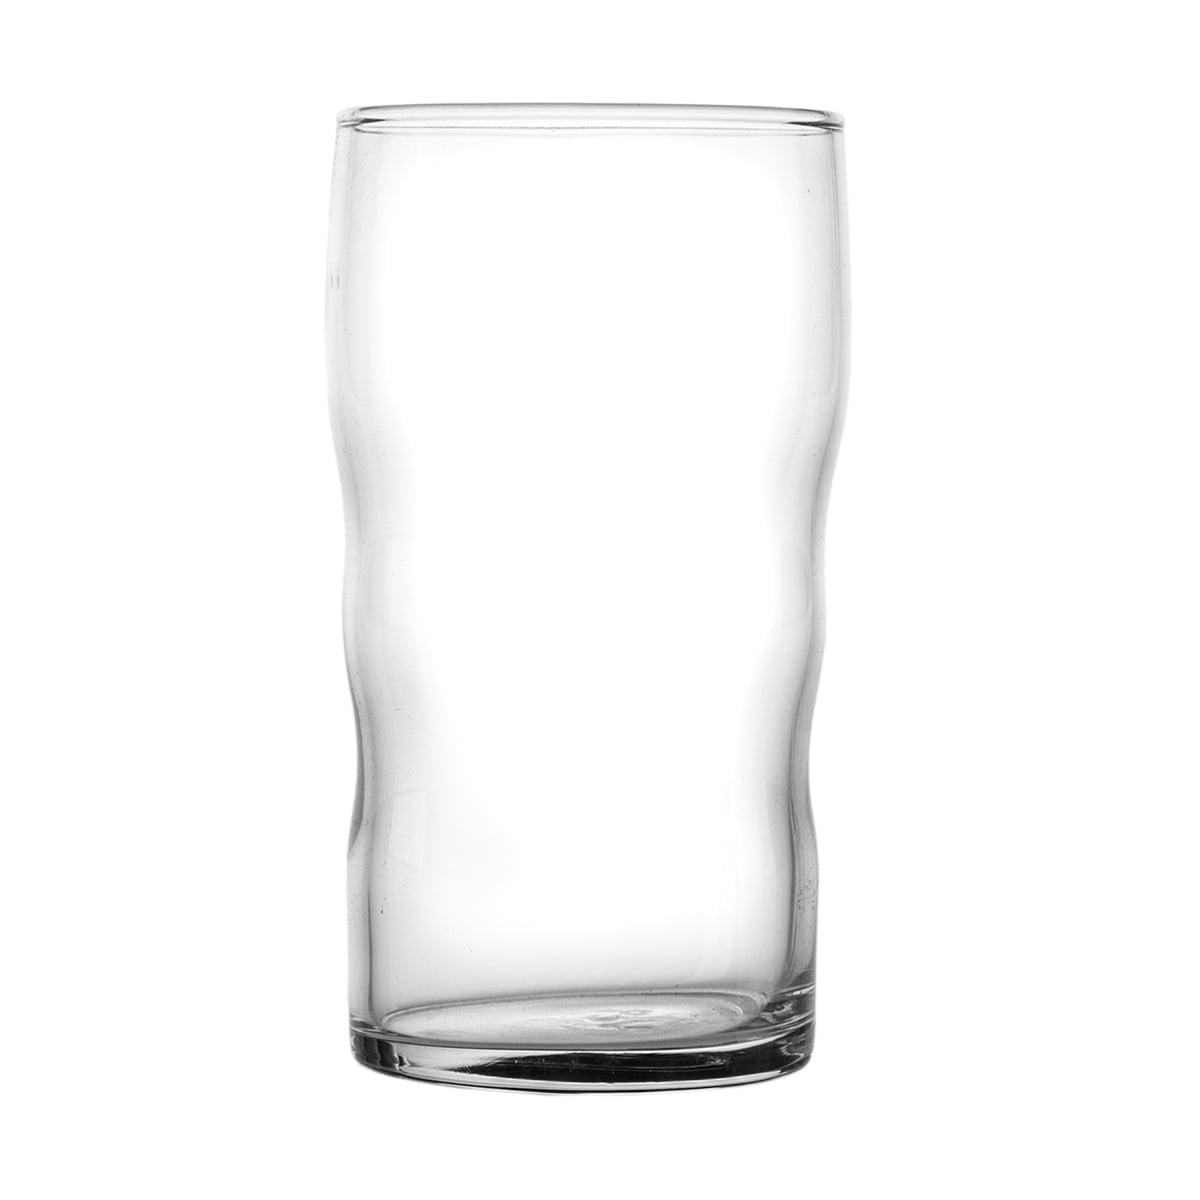 6 Libbey 10oz Collins Curved Cocktail Glasses 608 Restaurant Wholesale Bulk Lot by